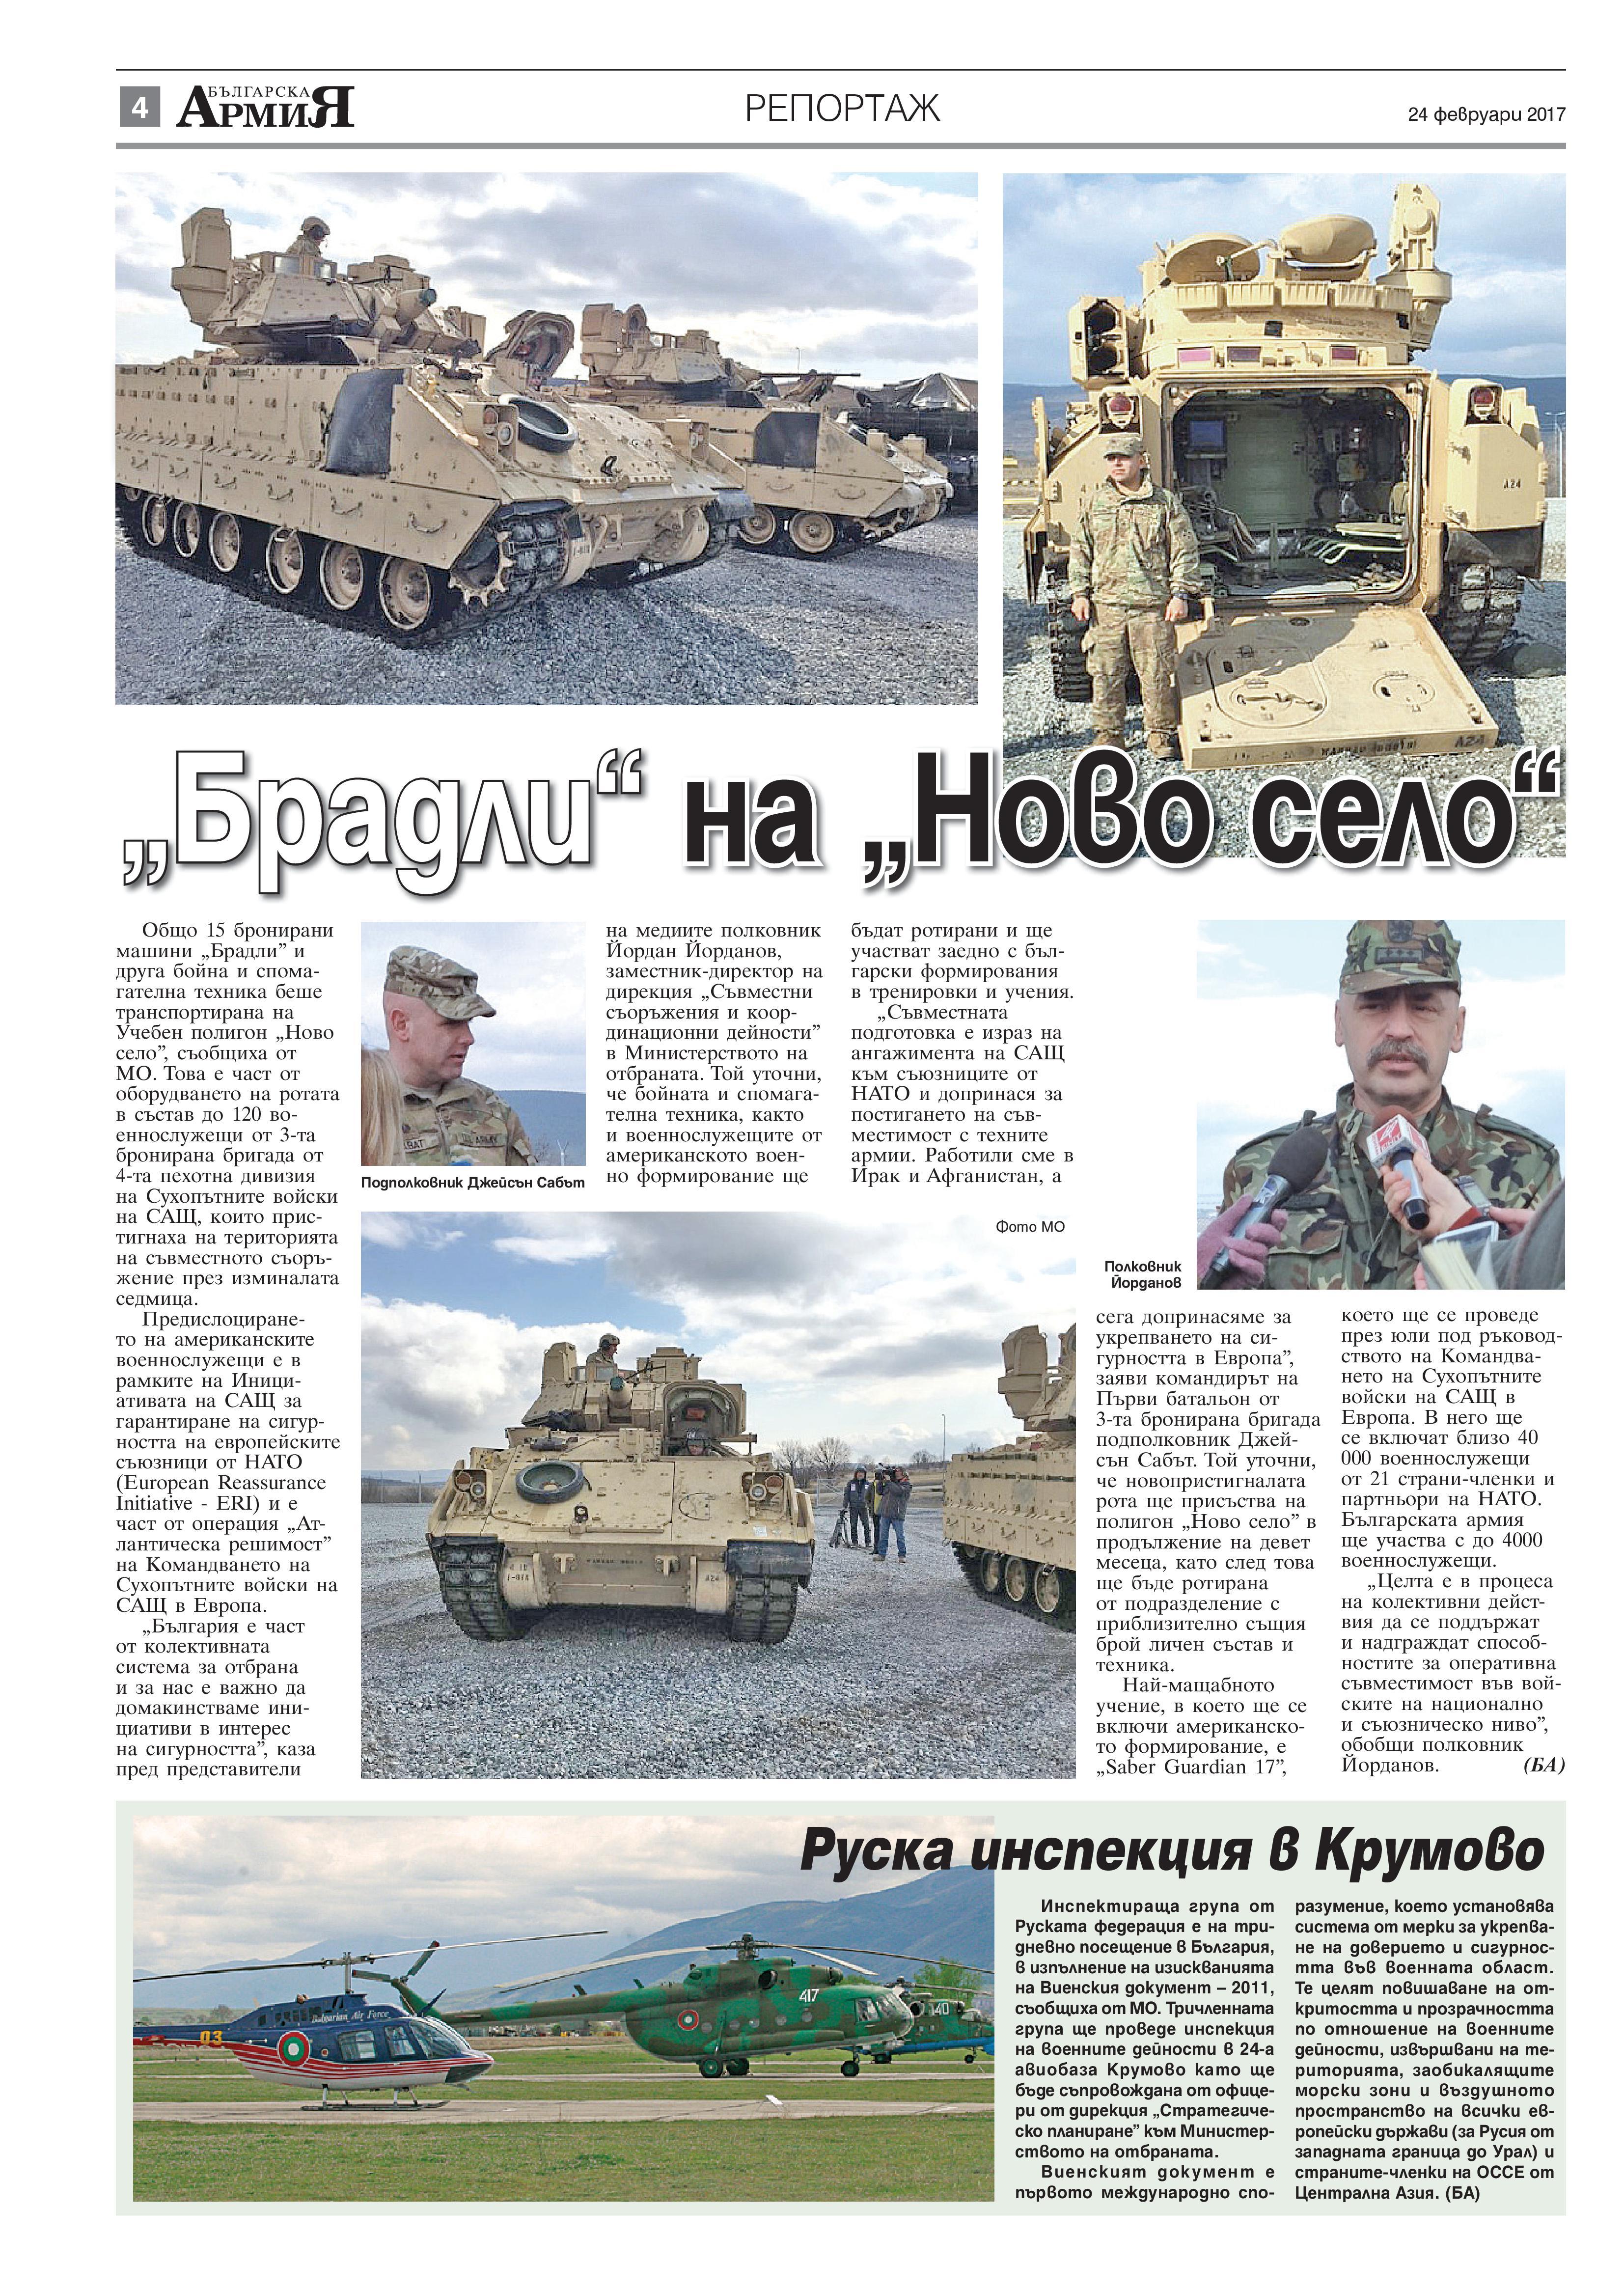 https://www.armymedia.bg/wp-content/uploads/2017/02/04-1.jpg